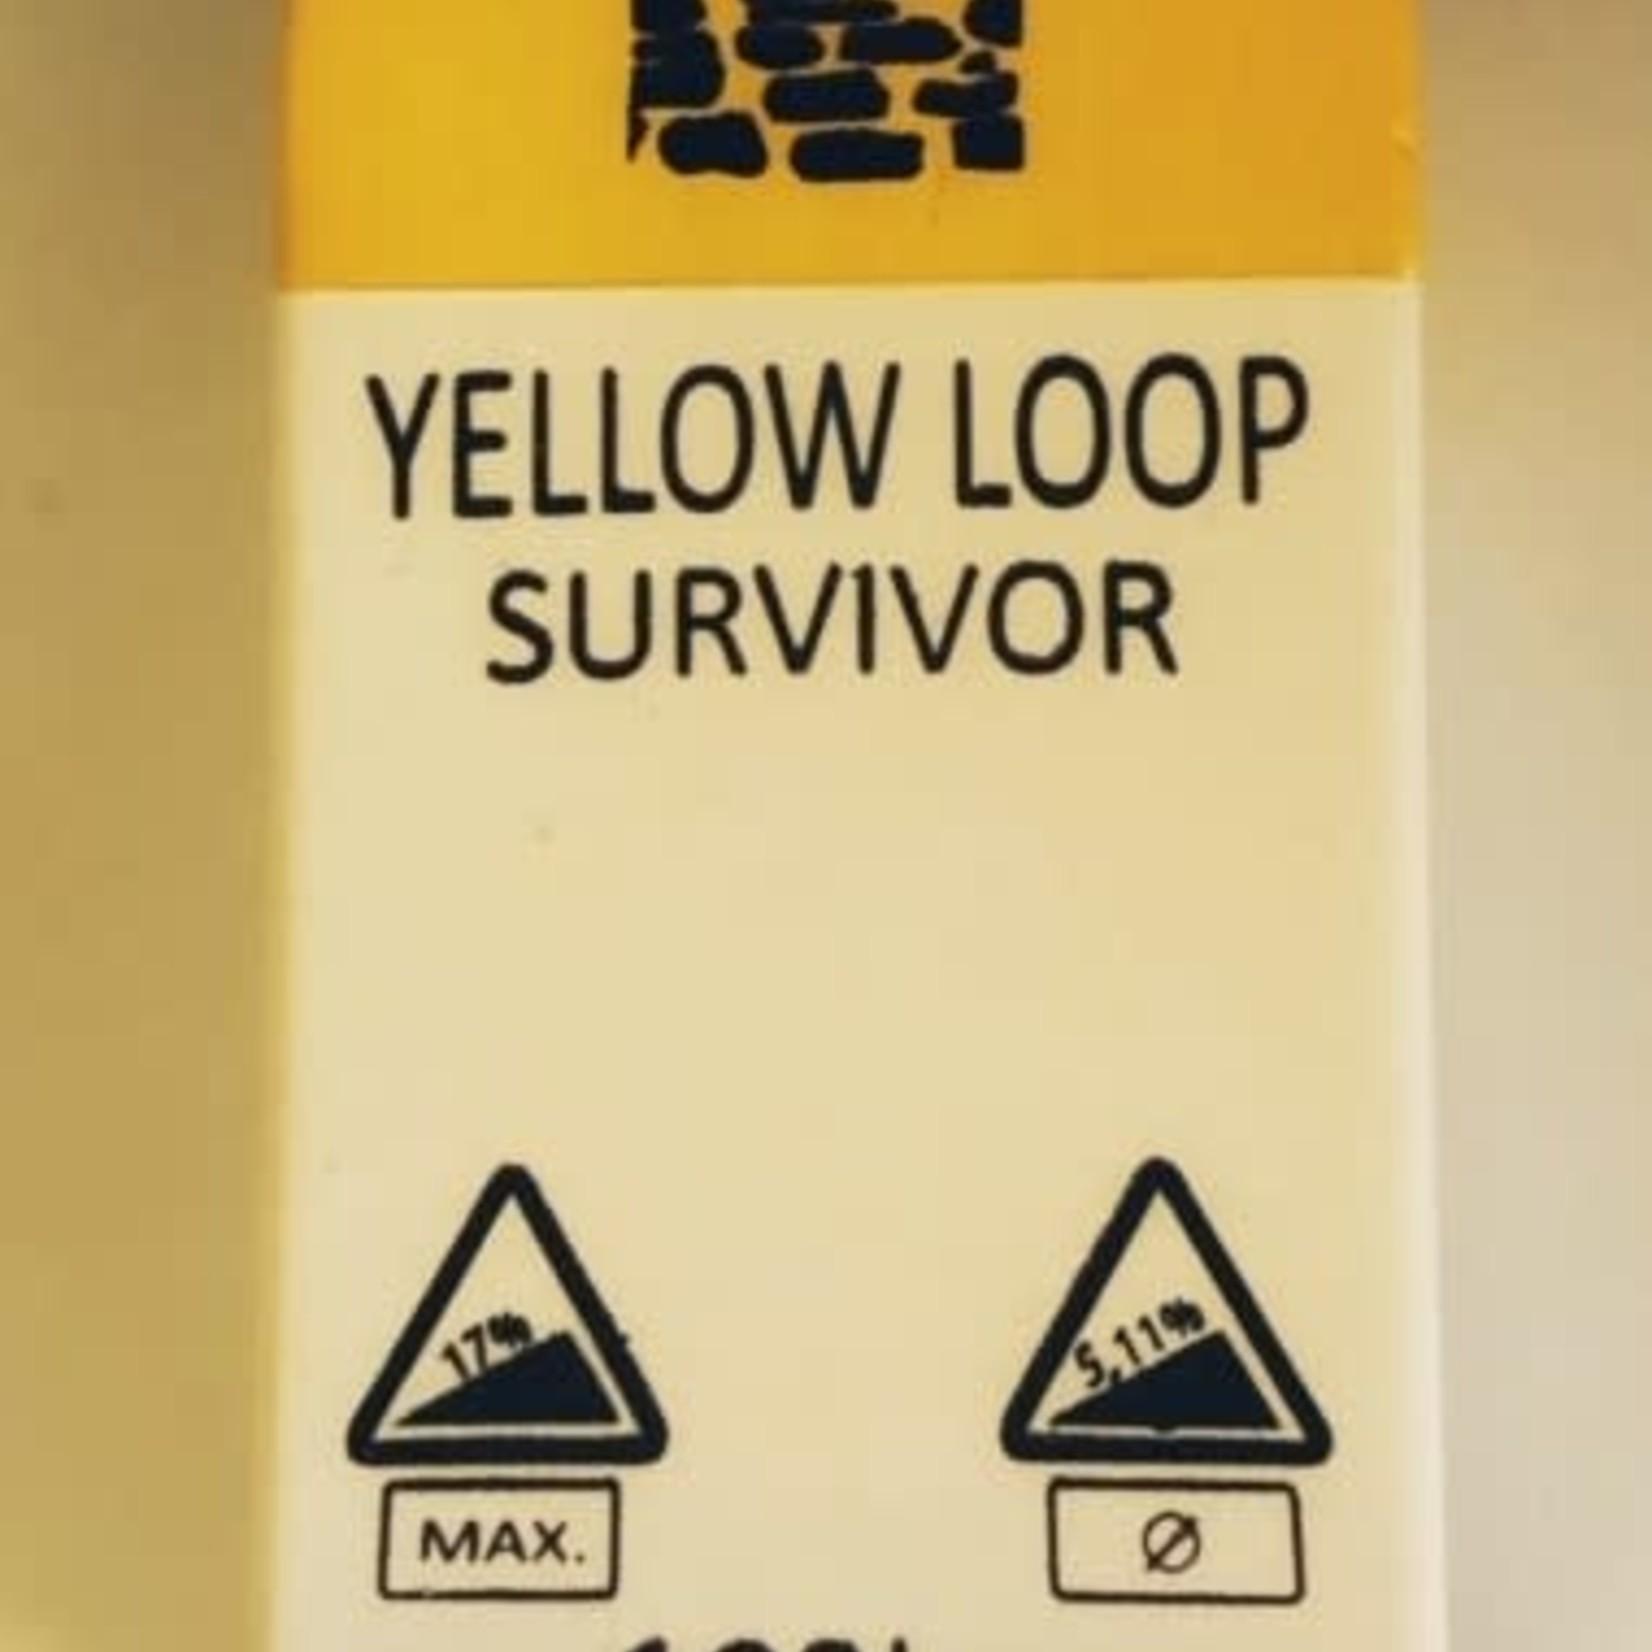 Milestone yellow loop